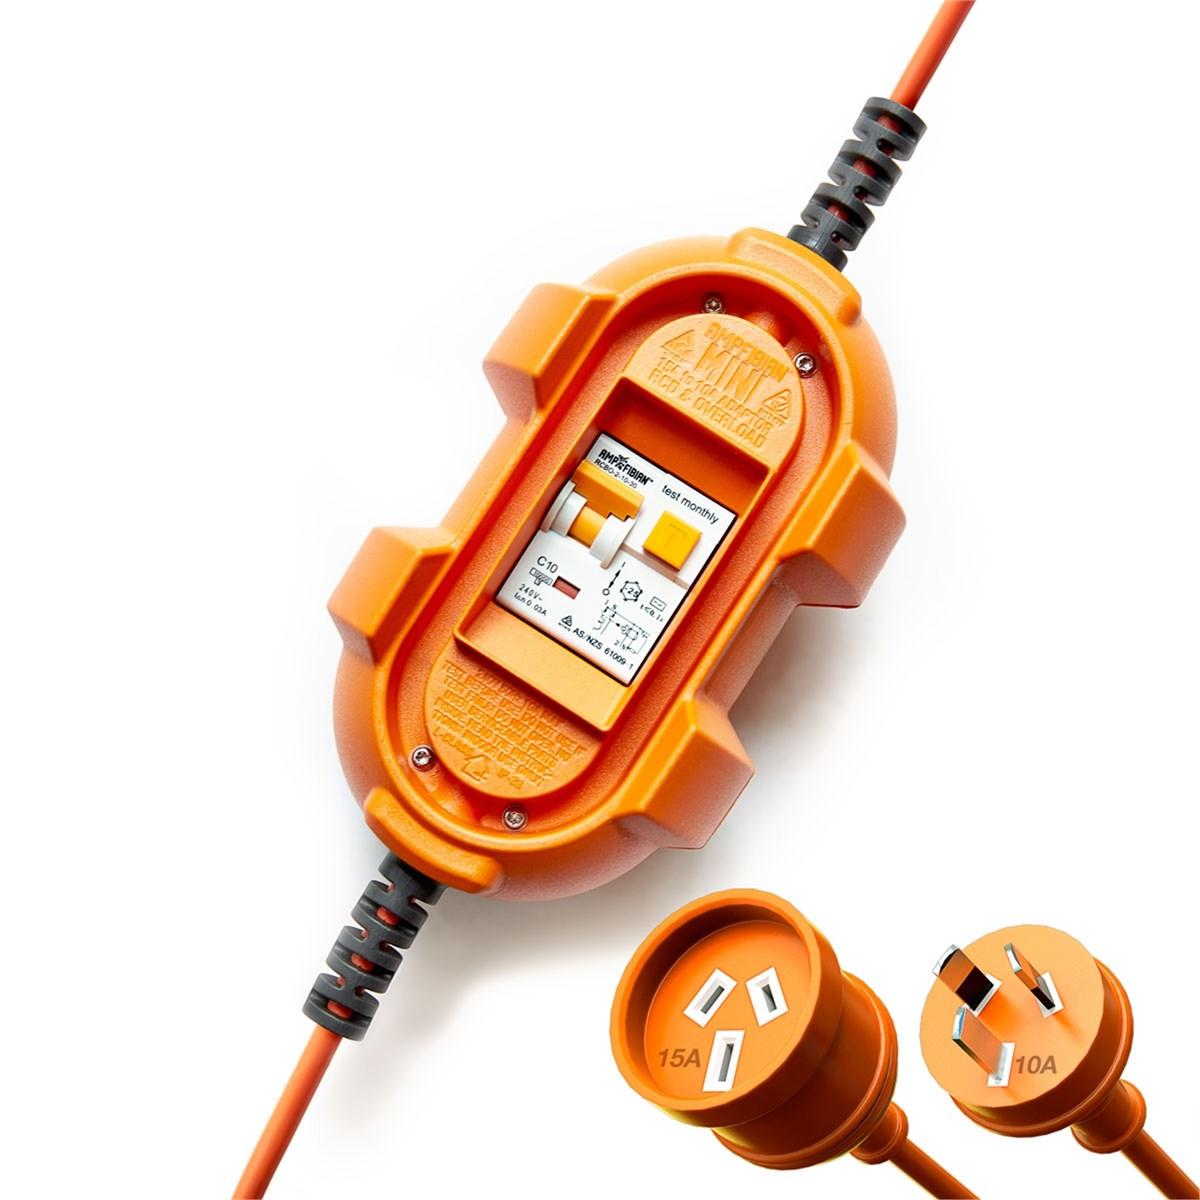 Topnotch 10A til 16A adapter med 10A sikring? - ByggeBolig GB57